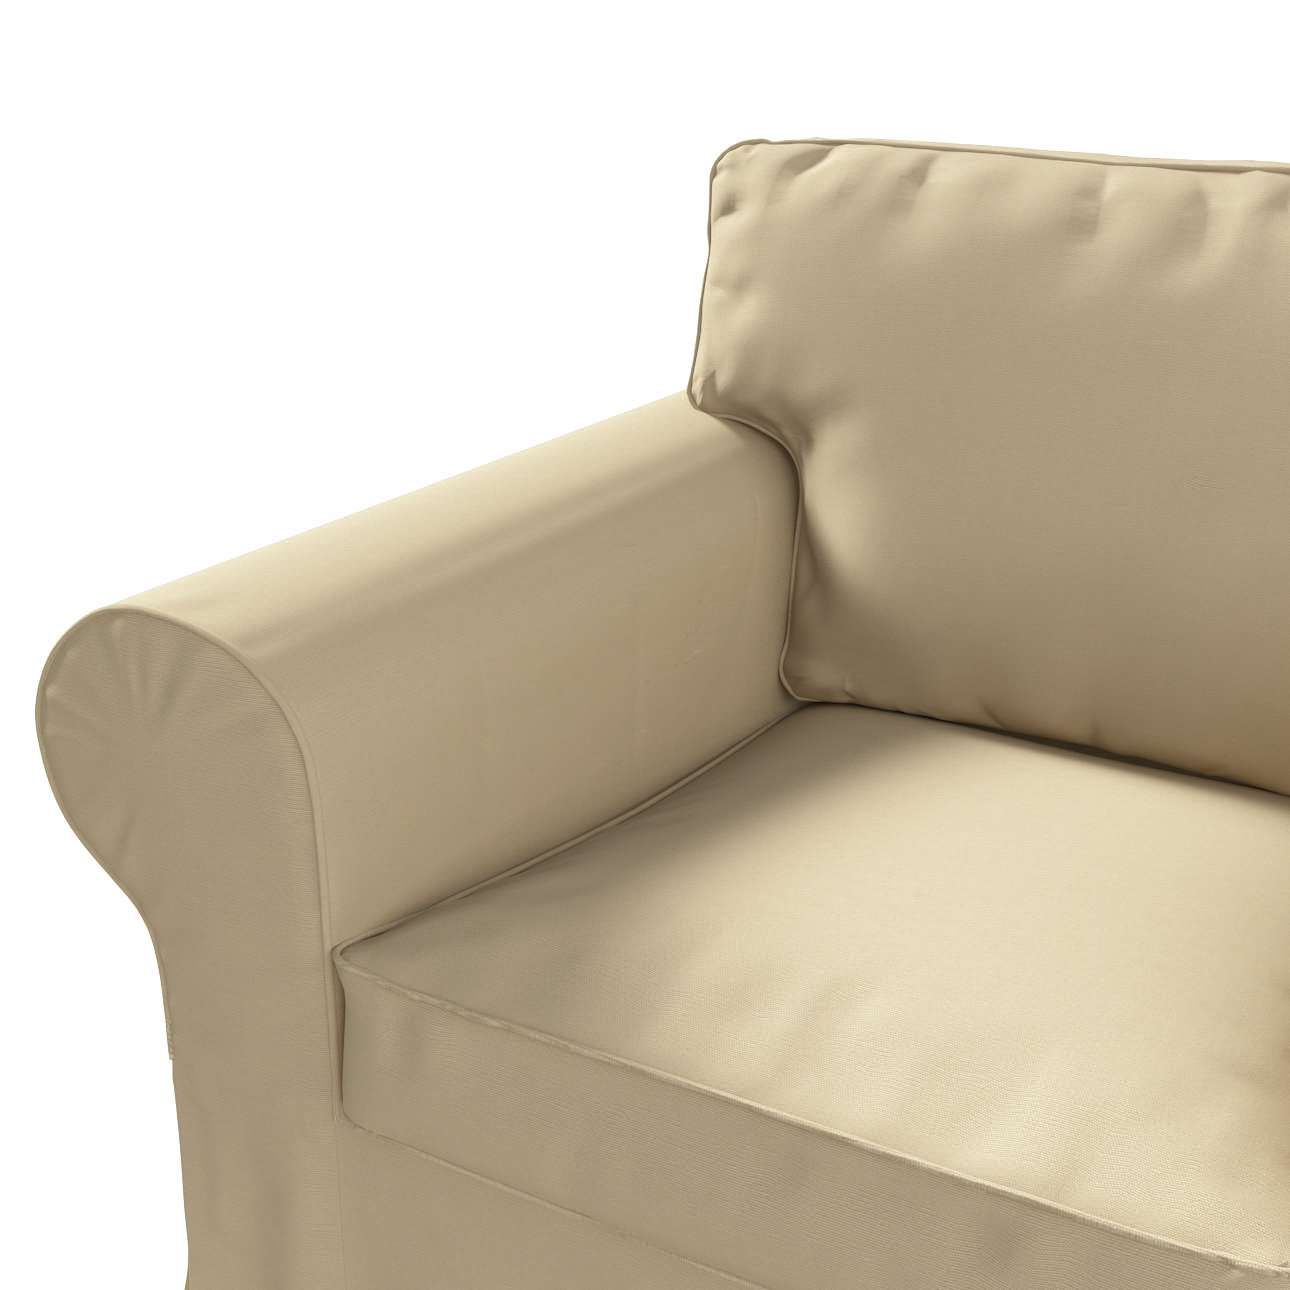 Potah na křeslo IKEA Ektorp kØeslo Ektorp v kolekci Cotton Panama, látka: 702-01